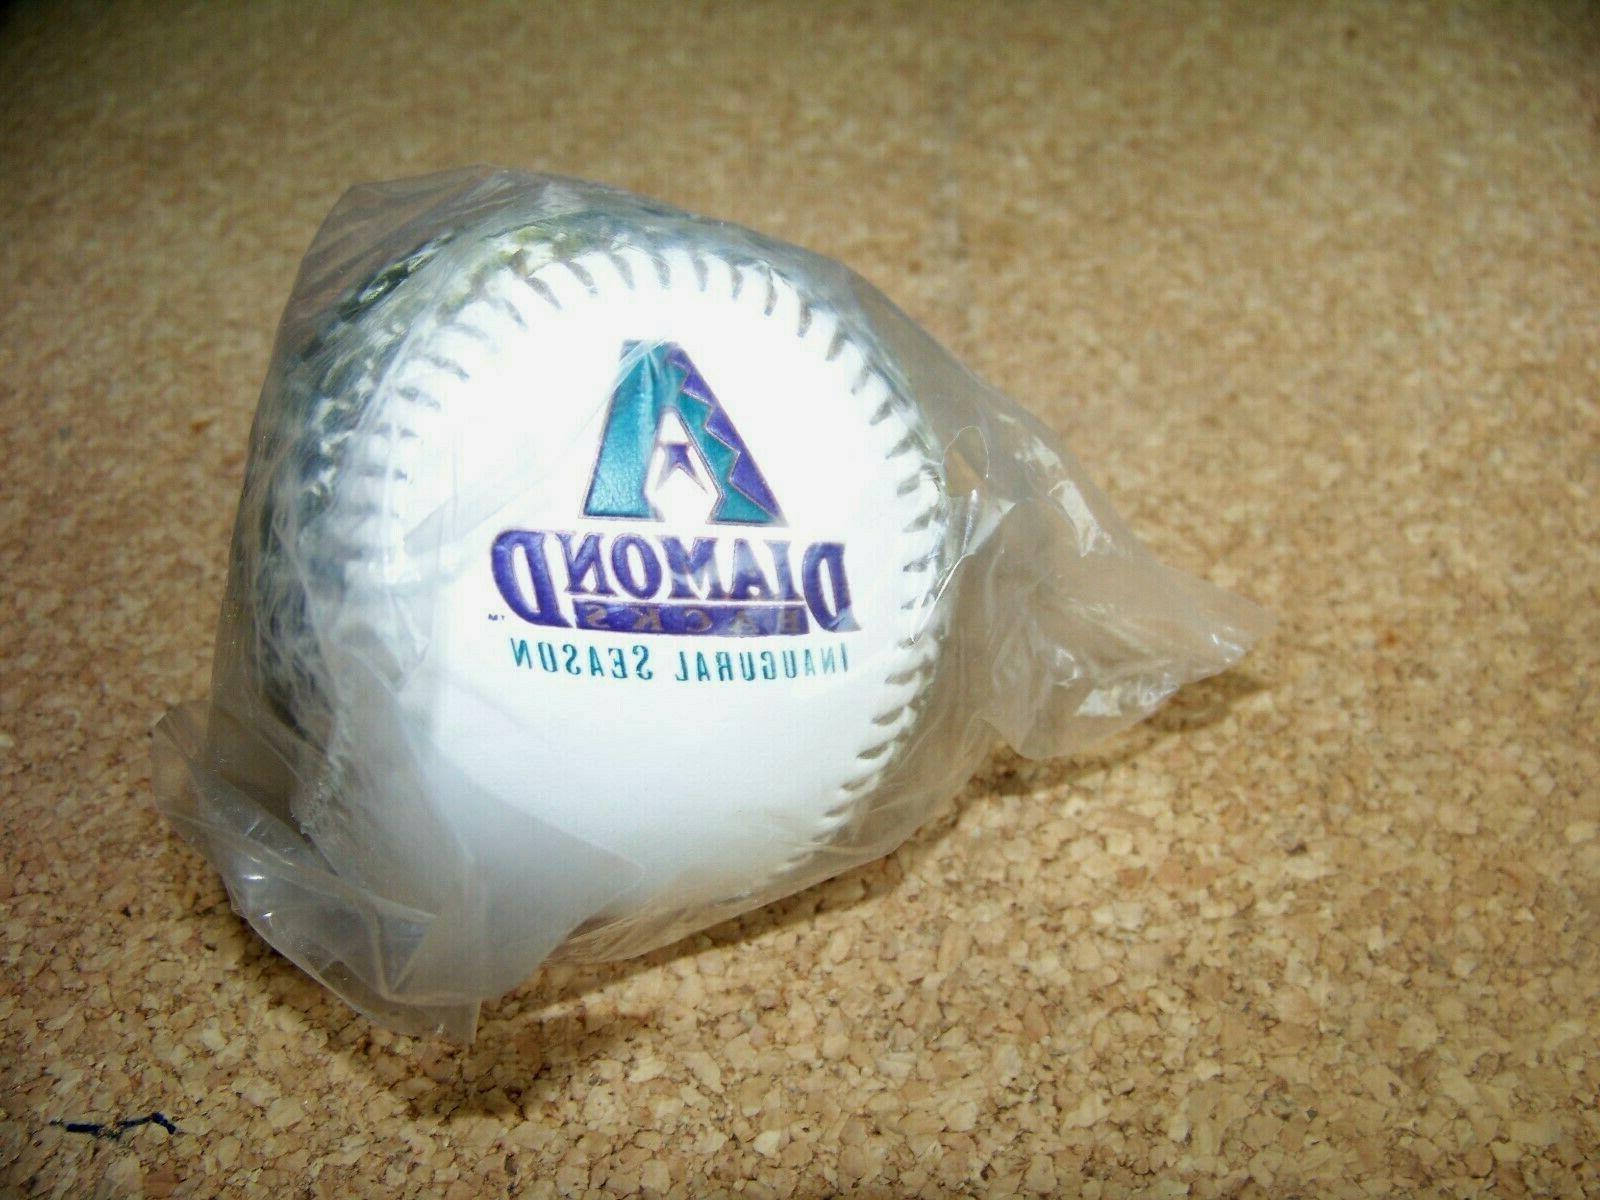 1998 Diamondbacks baseball ball design MLB